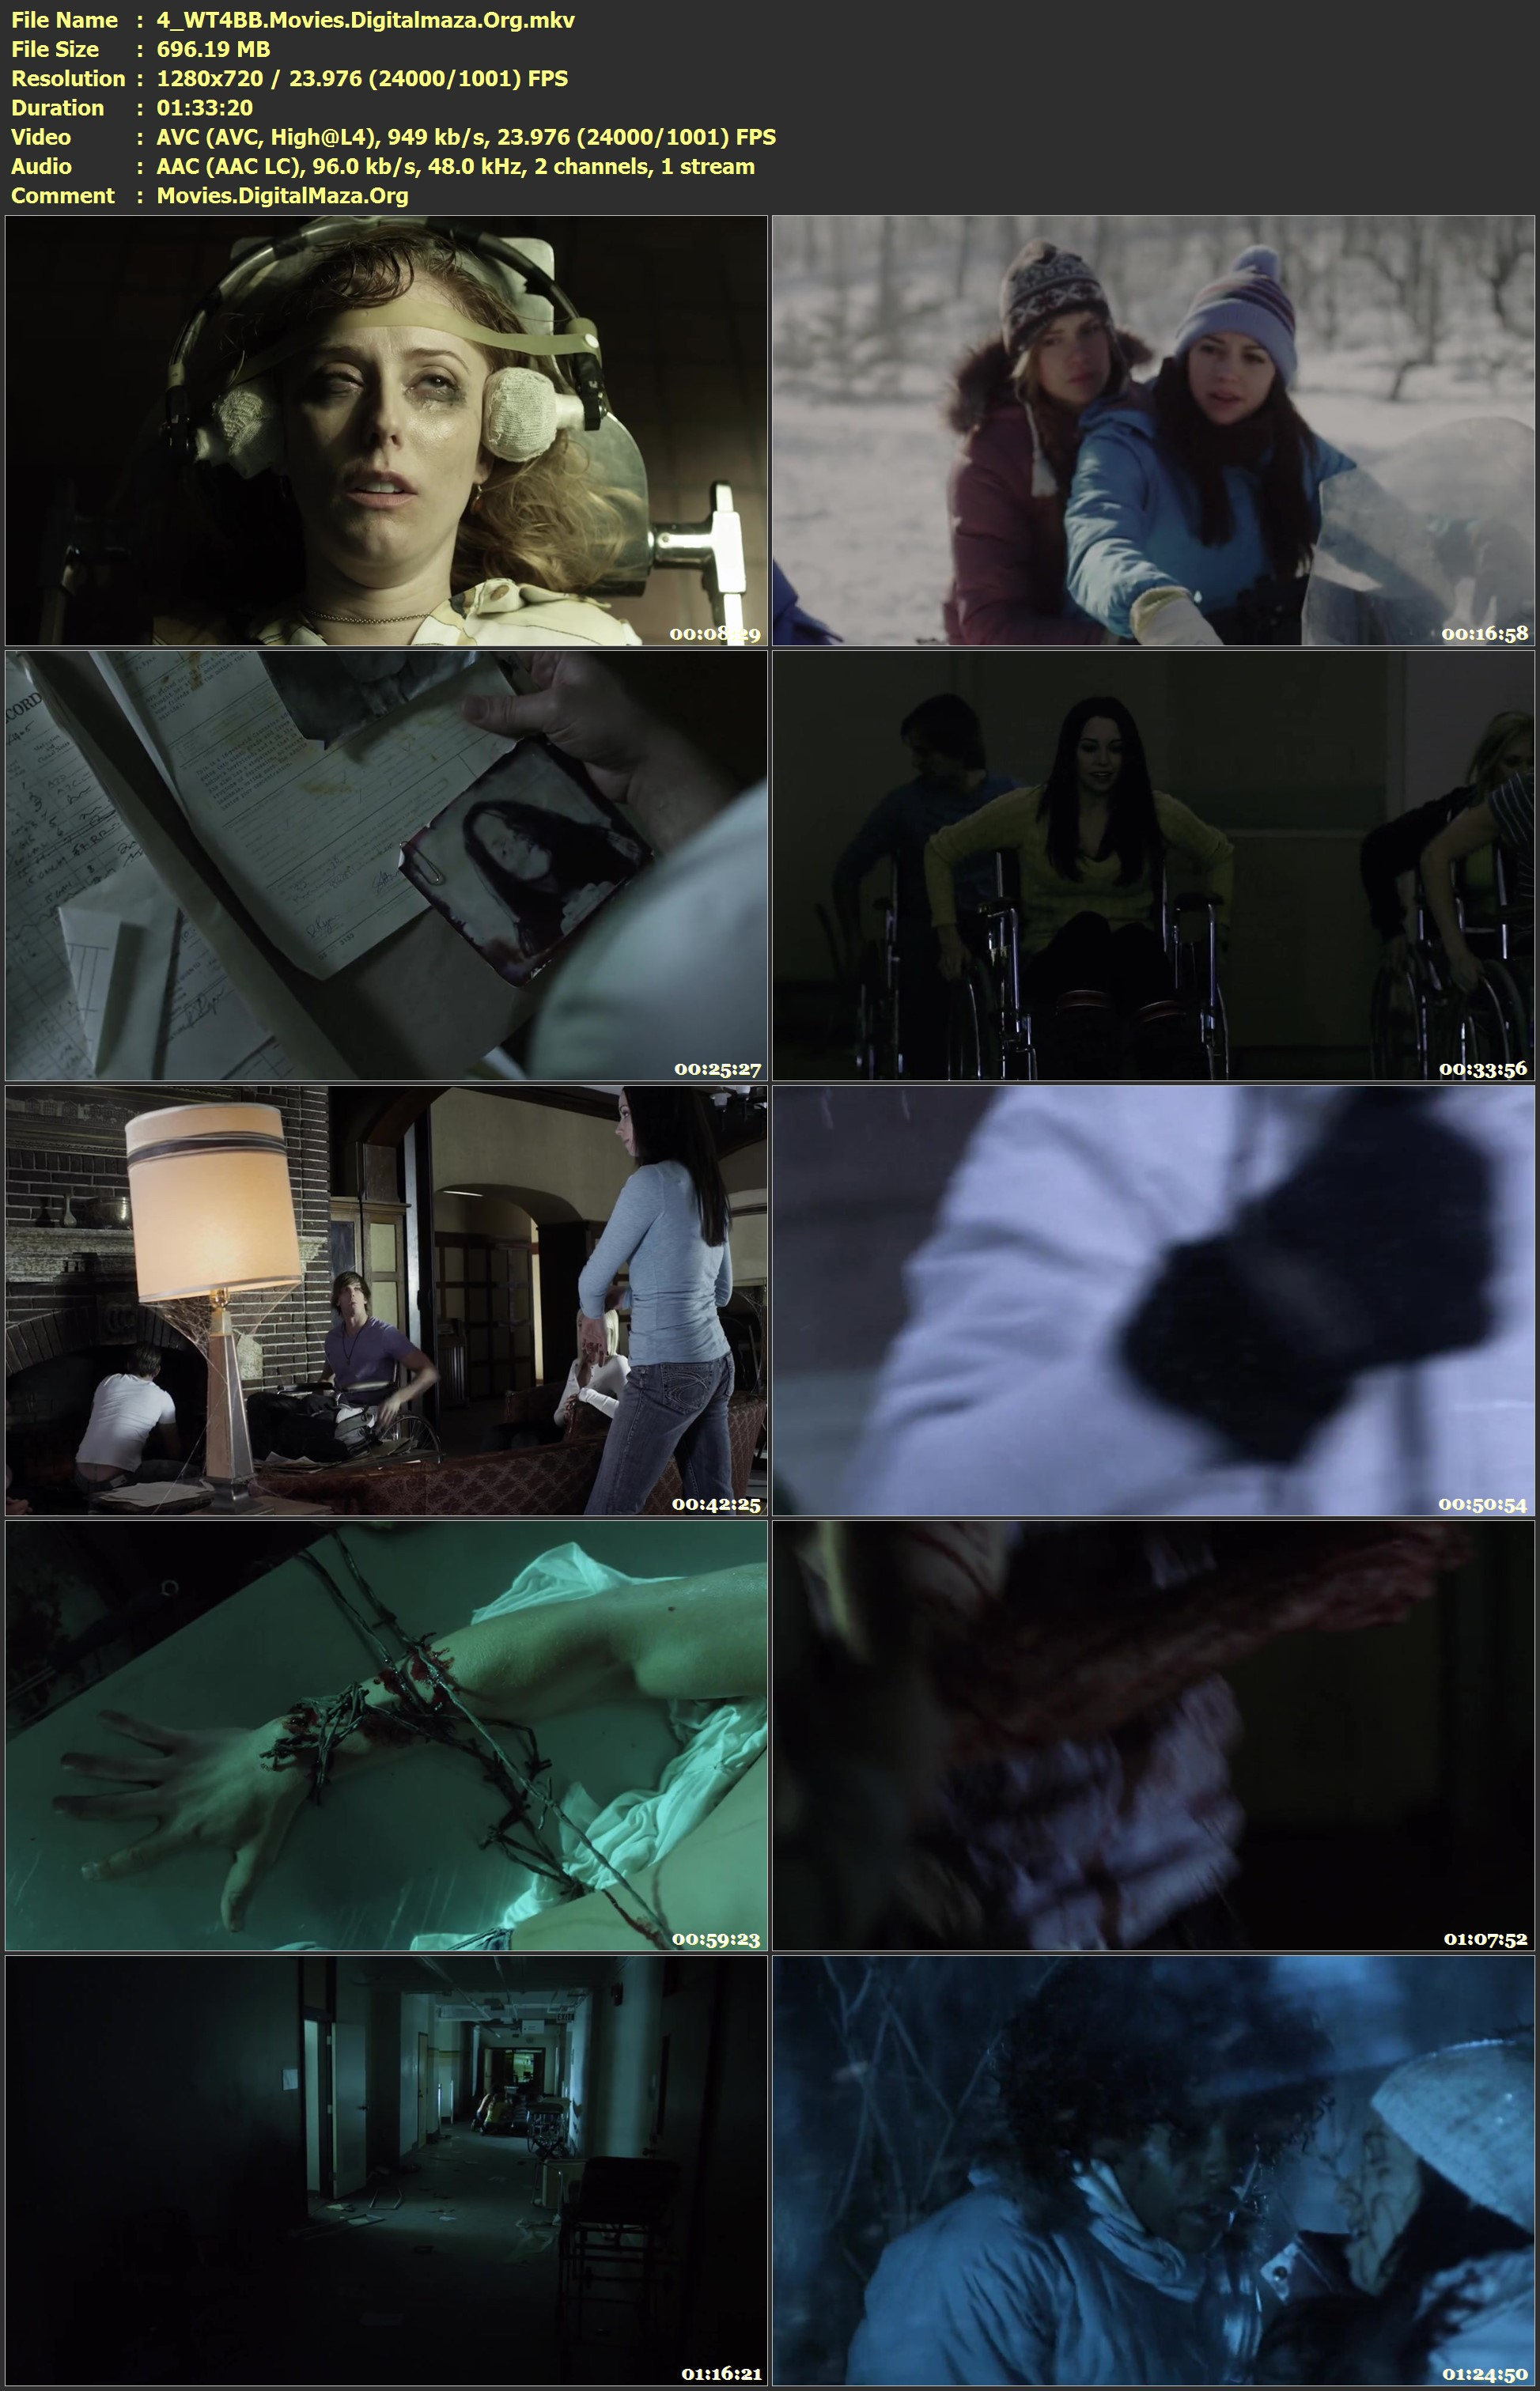 https://image.ibb.co/n4aG2c/4_WT4_BB_Movies_Digitalmaza_Org_mkv.jpg